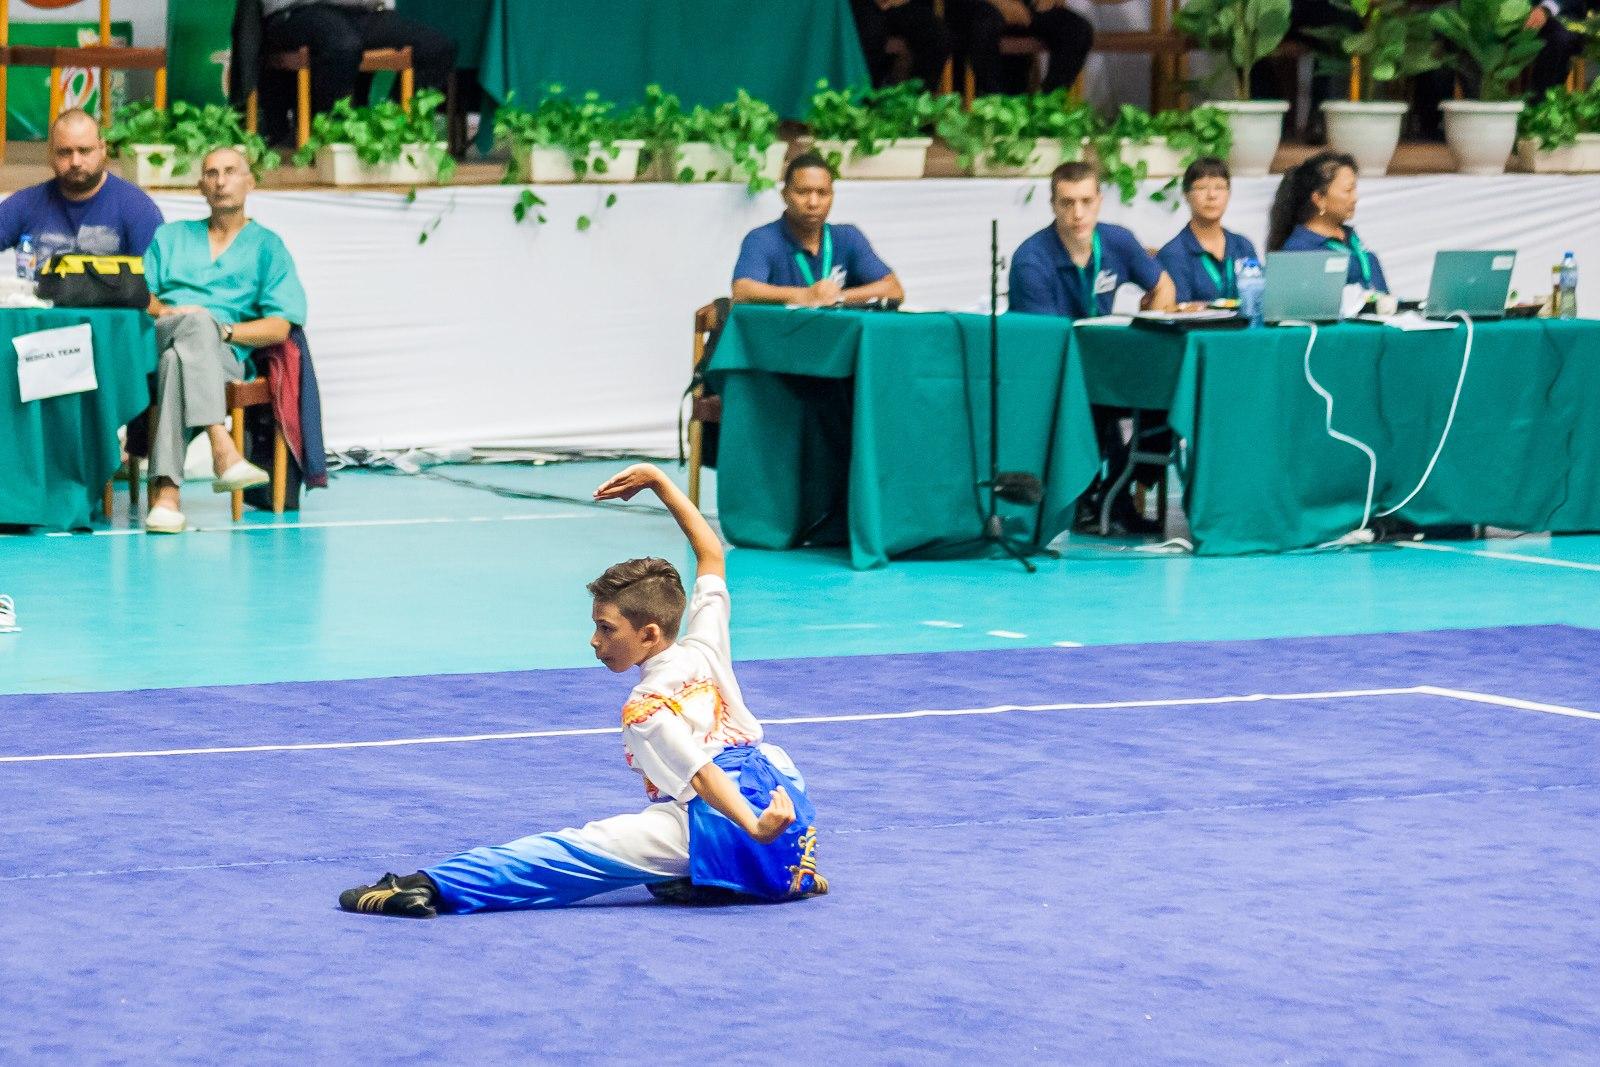 Wayland_Li_World_Wushu_Championships_Changquan_Longfist_2016_Bulgaria_Canada_12.jpg